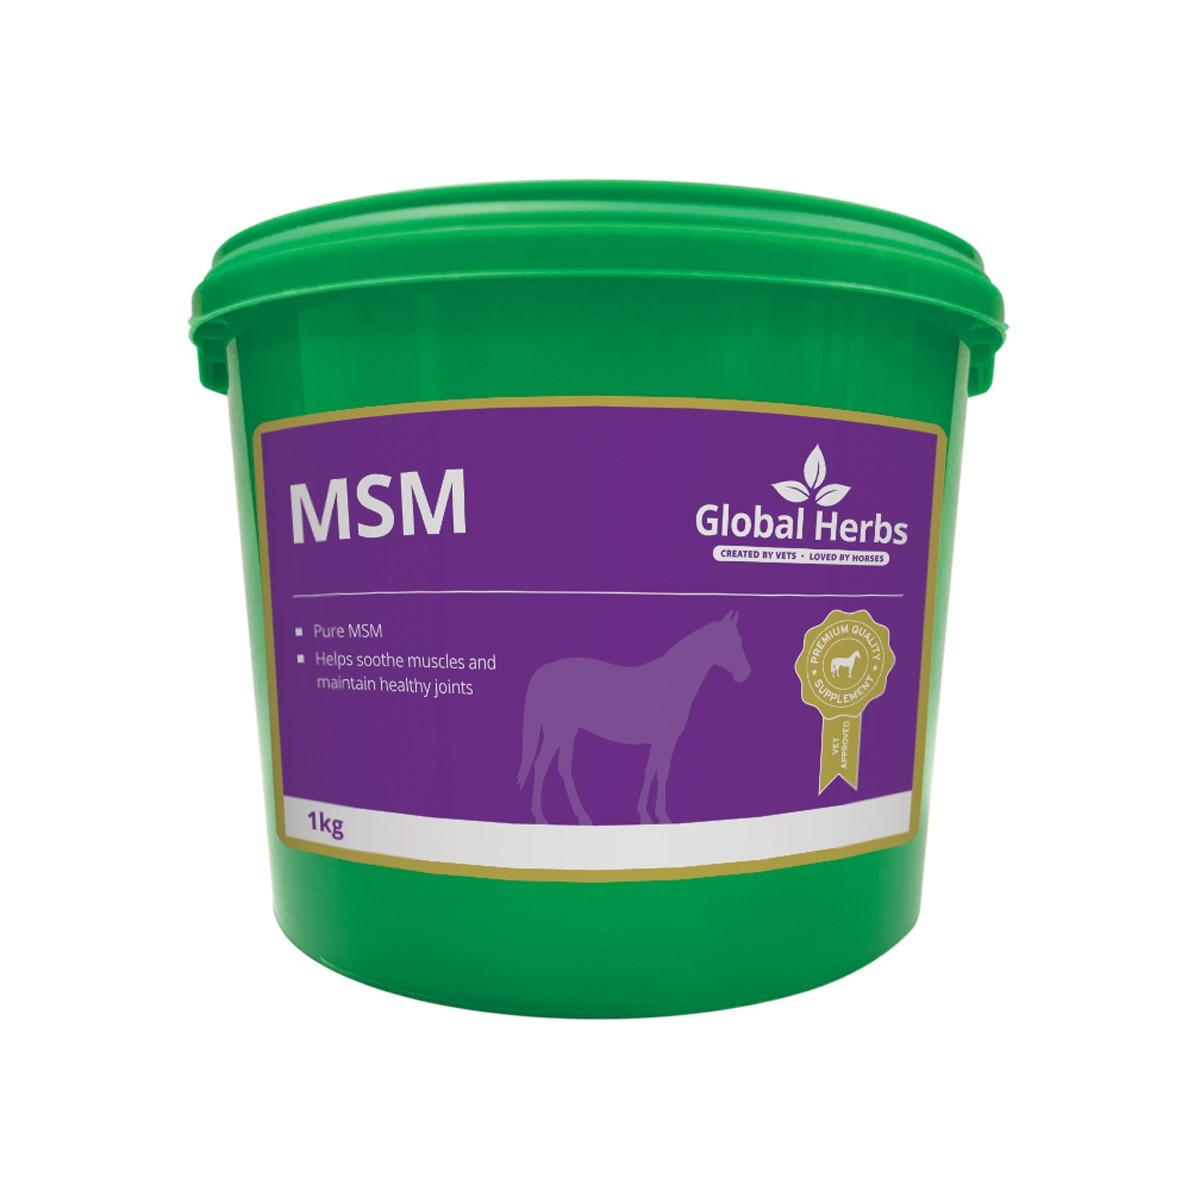 Global Herbs Pure MSM